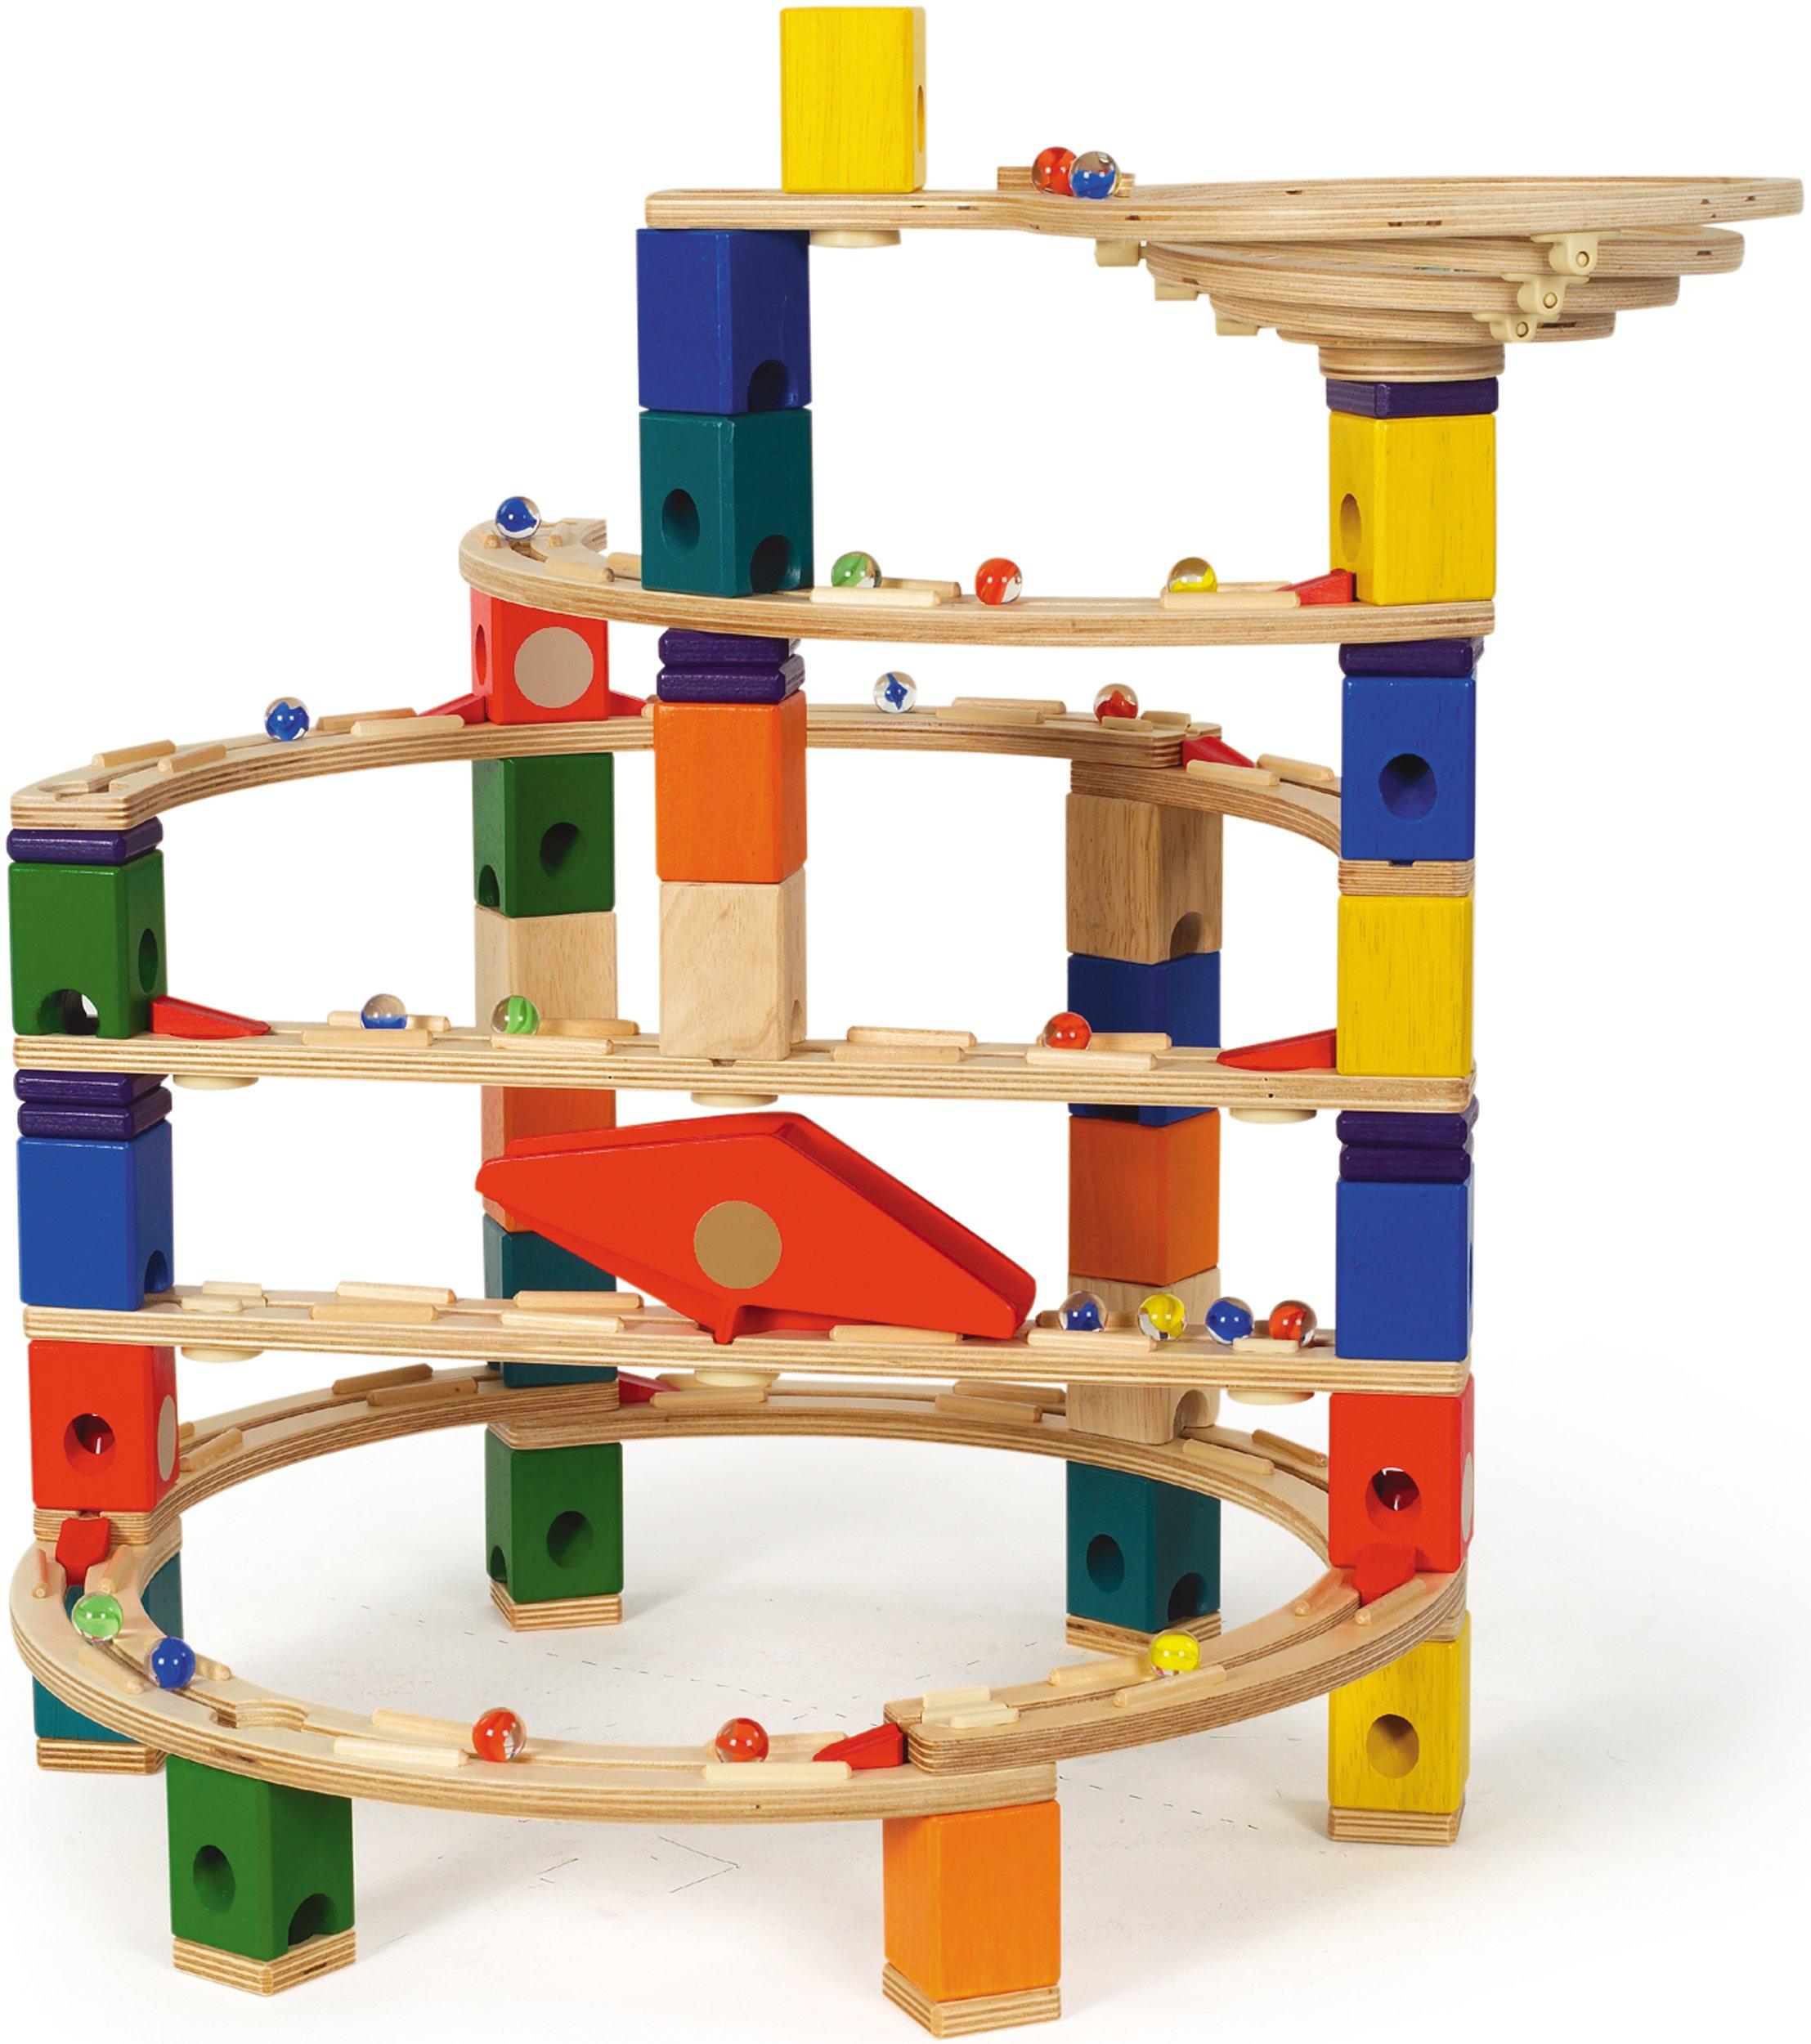 Hape Quadrilla Wooden Marble Run Construction Quadrilla Basic Set 98 Pieces